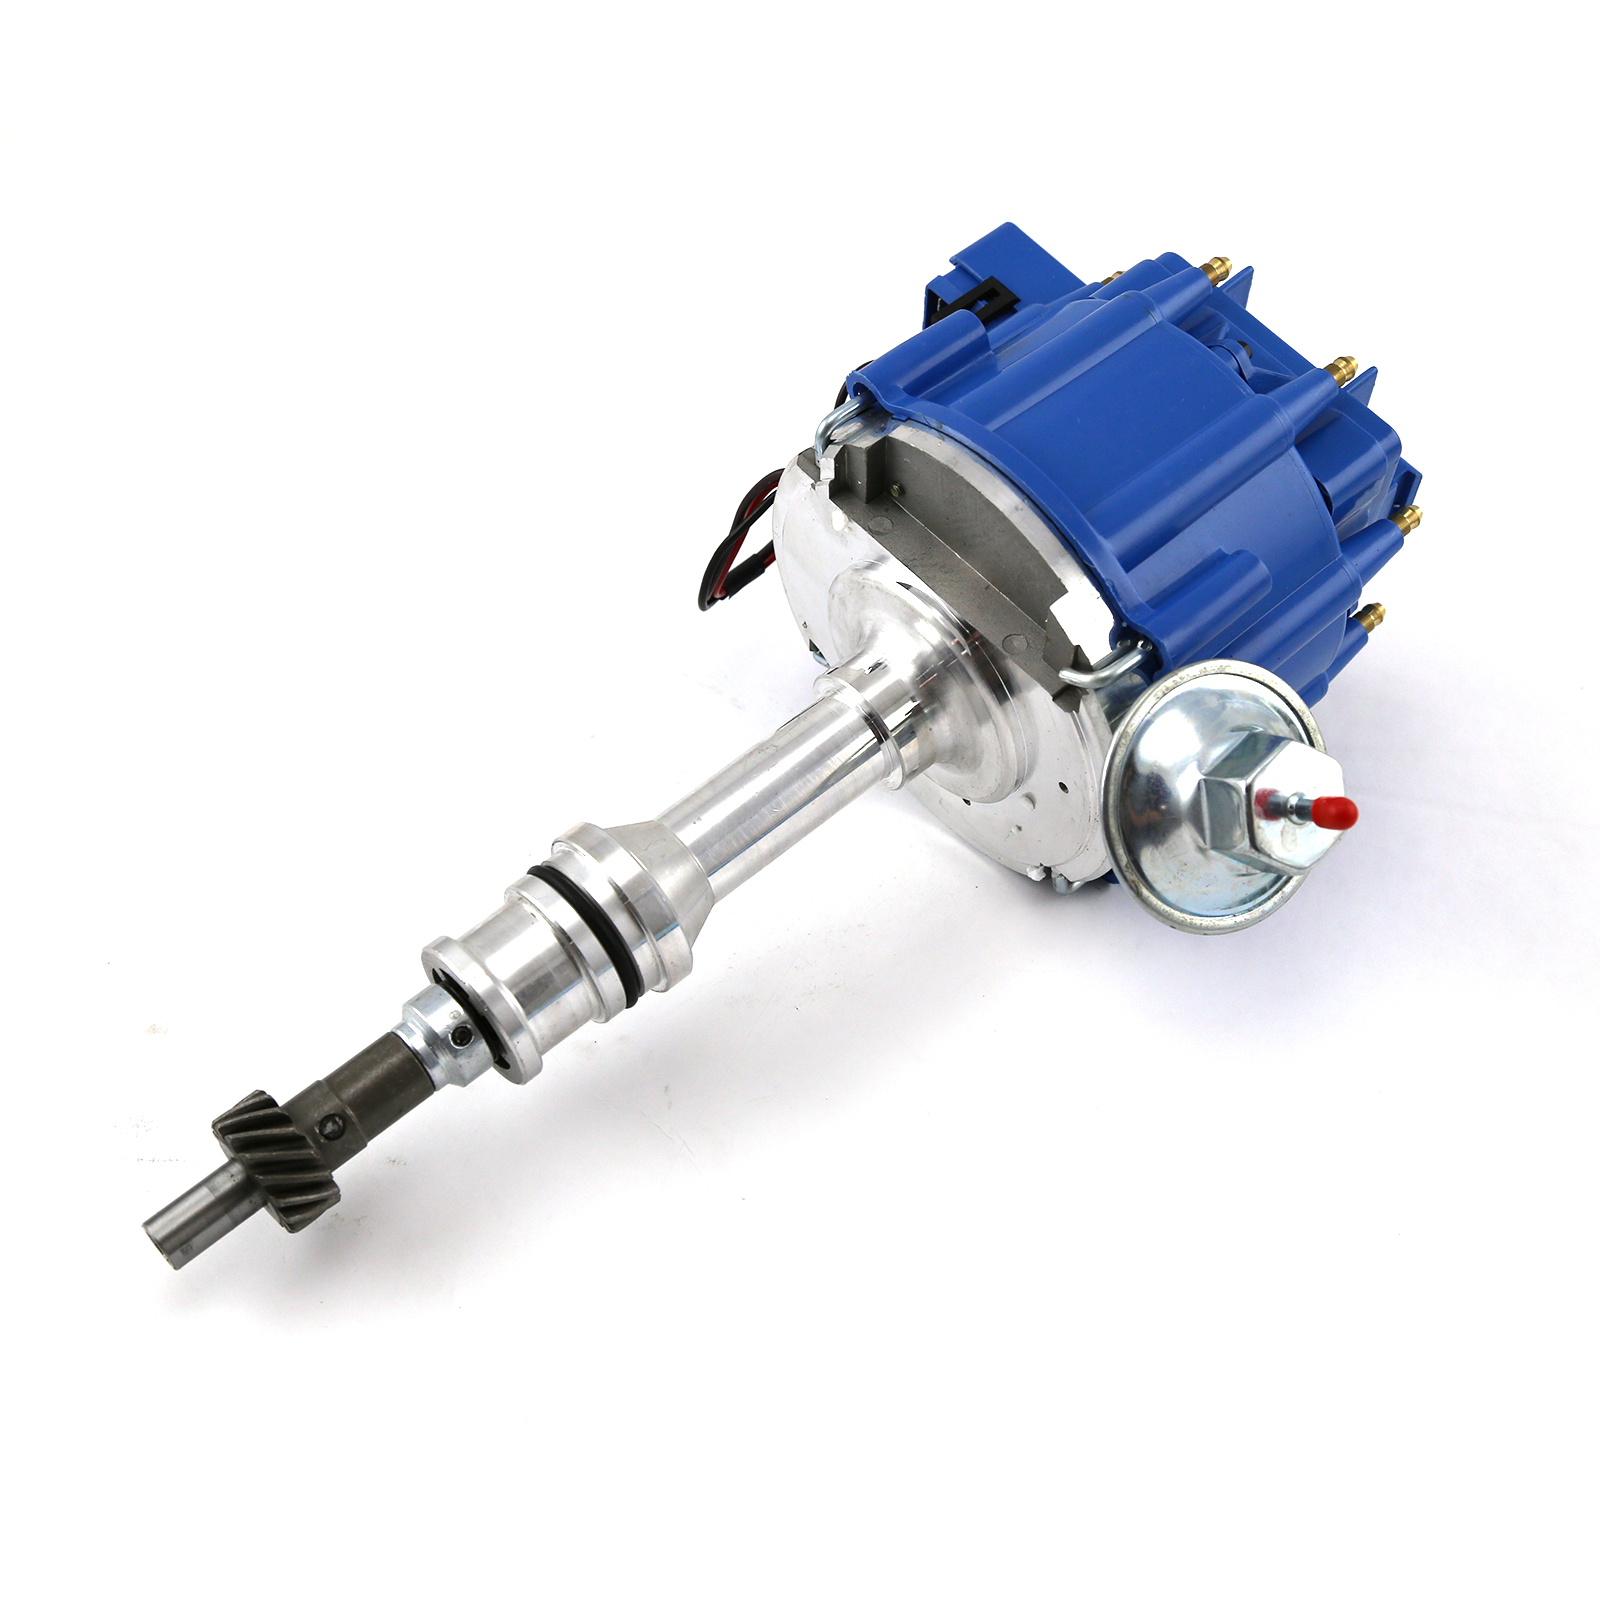 ford hei ignition vdo gauges wiring diagrams oil pressure sender diagram 351w windsor 65k coil electronic distributor